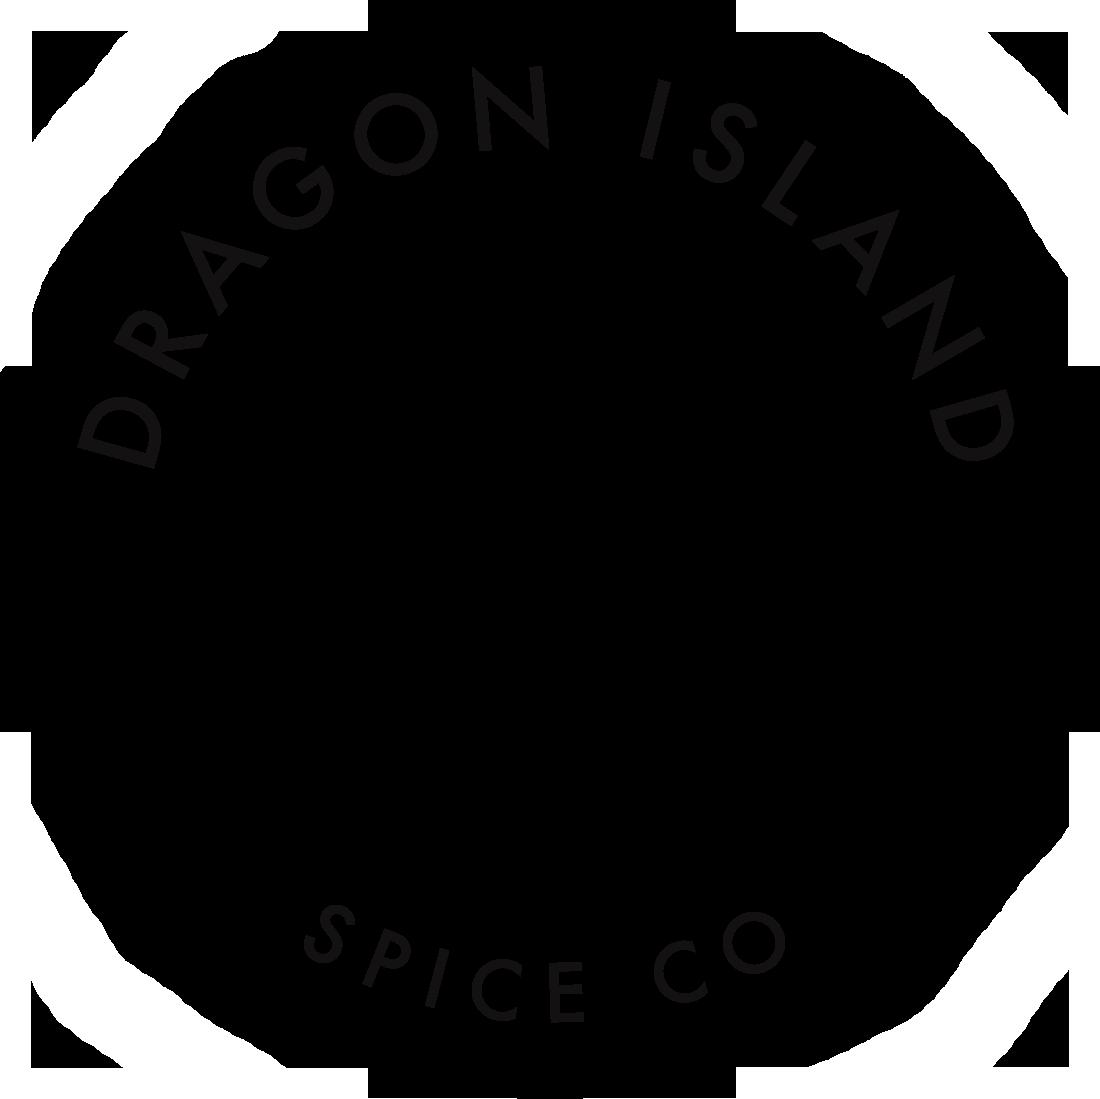 Dragon Island Spice Co.